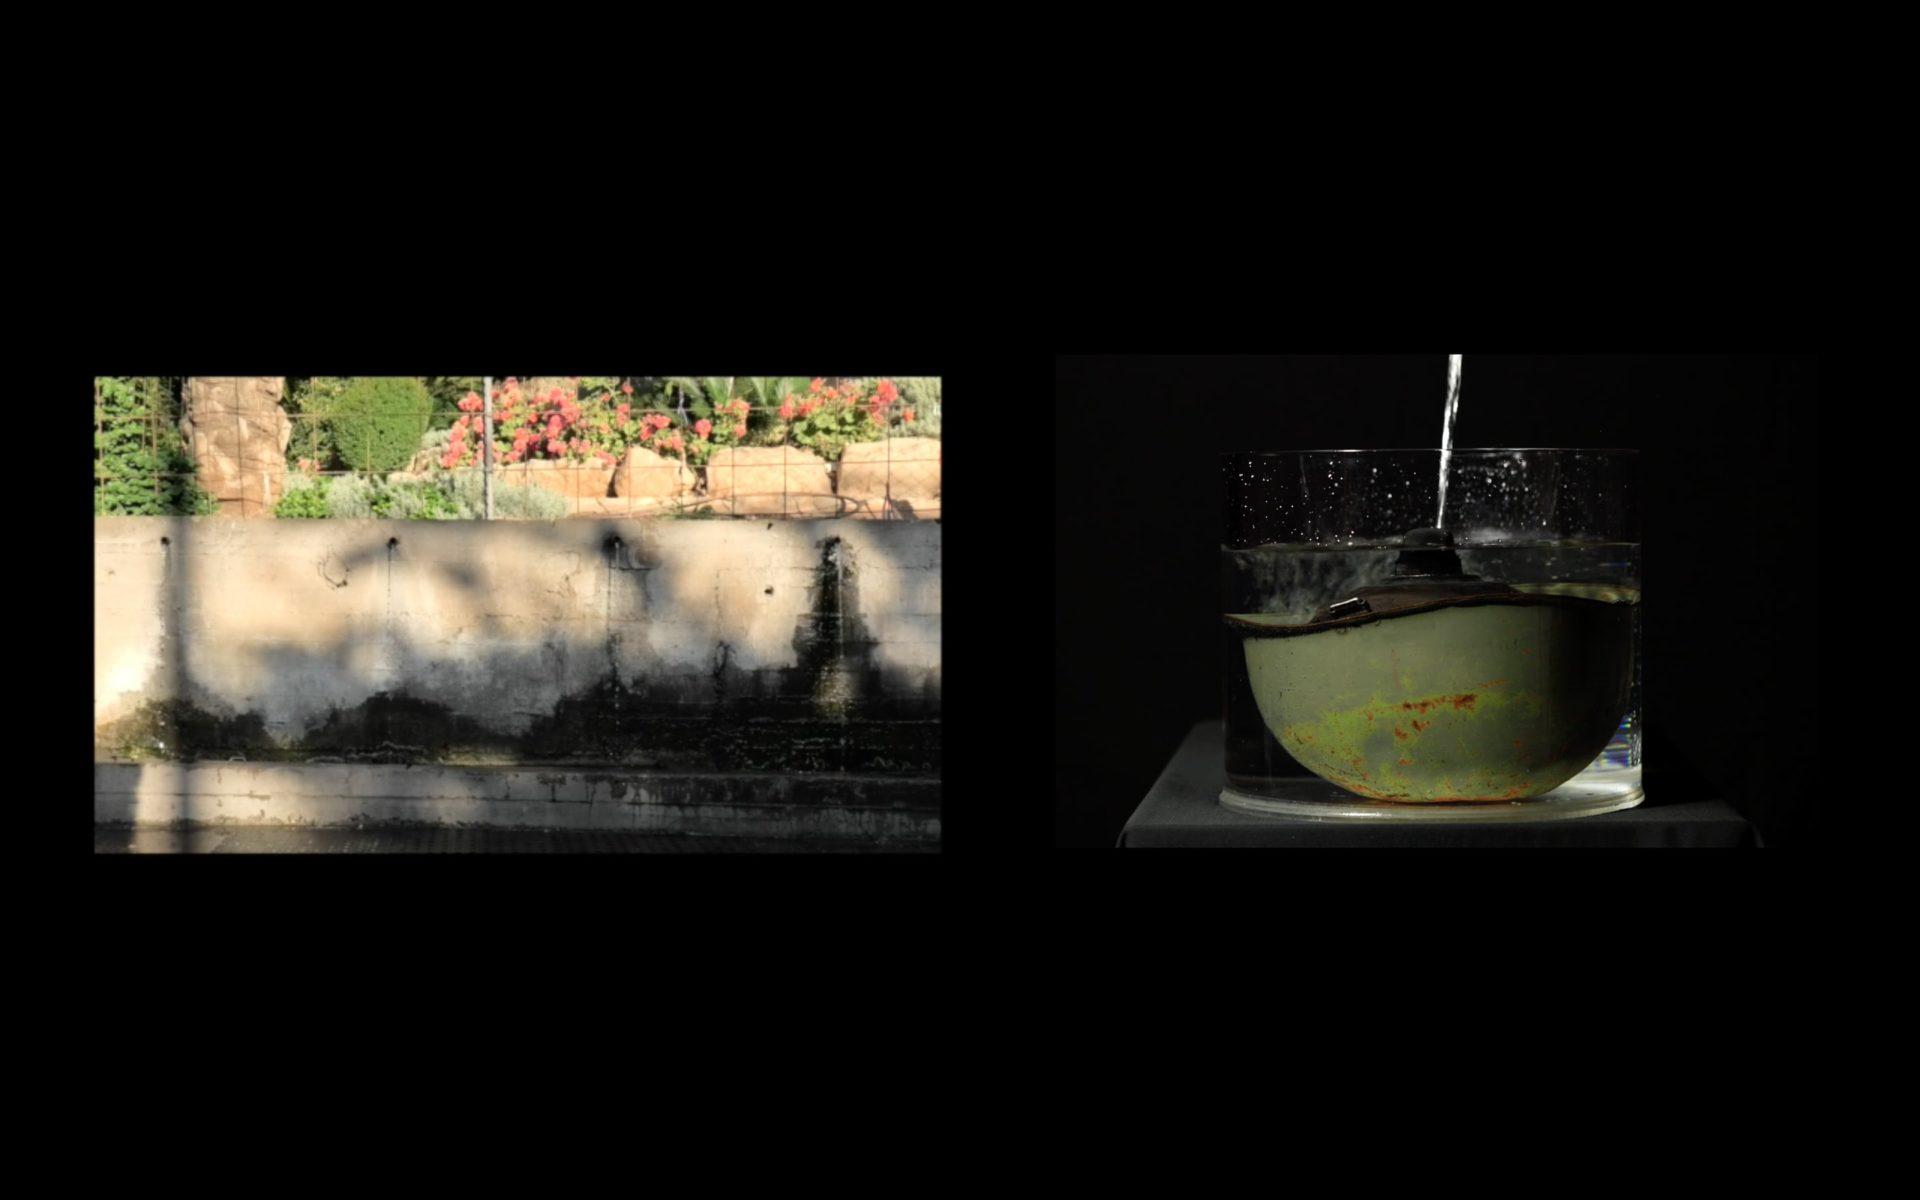 Ronen Zein, Drowning, 2020-2021, video diptych, 14 min, photograph